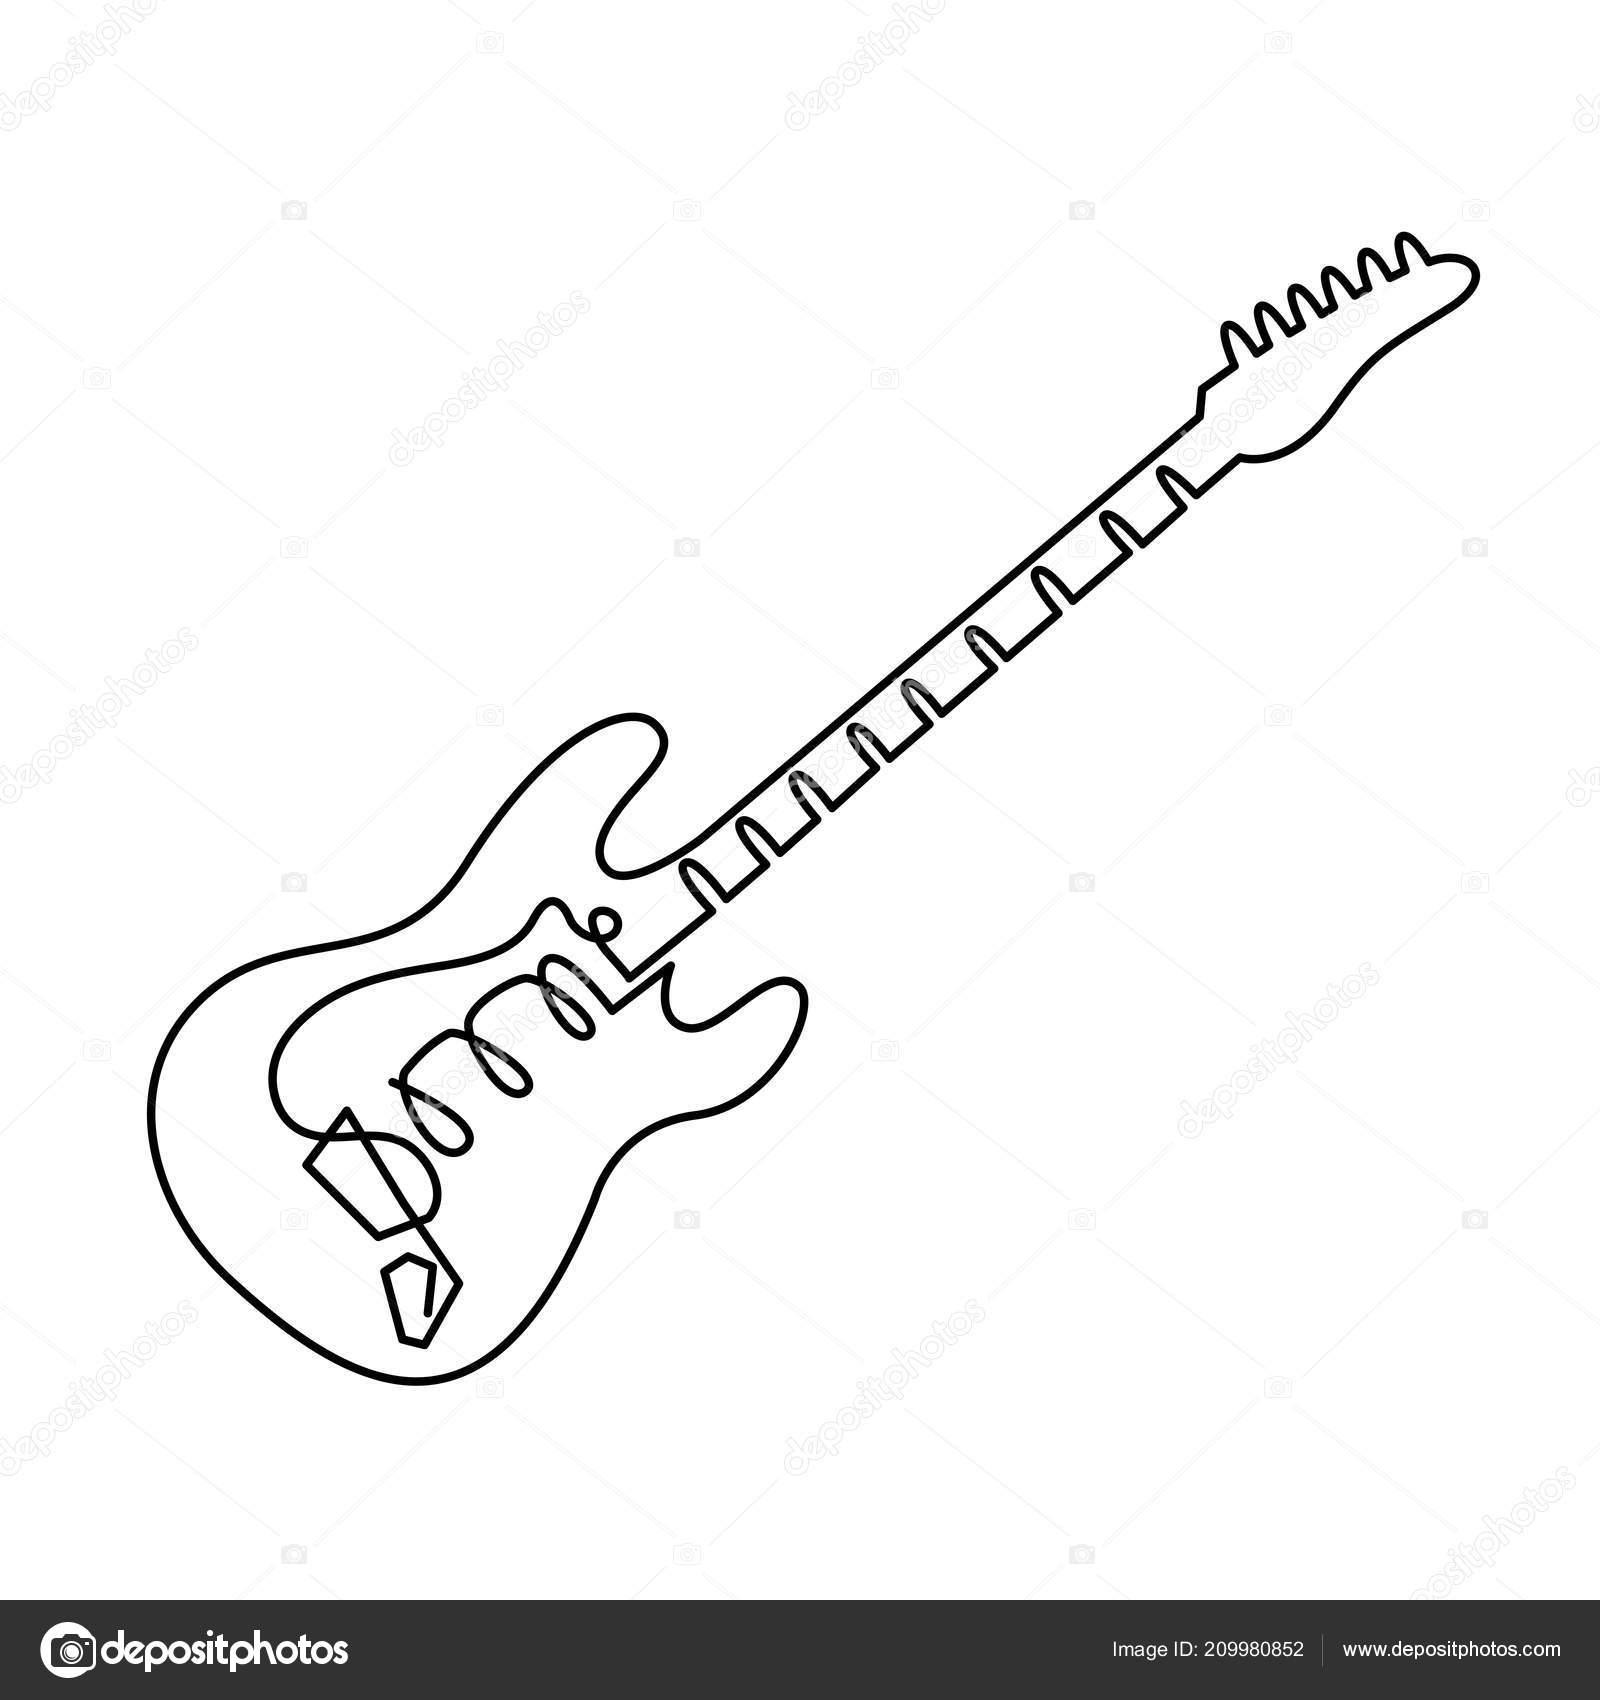 Linea Continua Dibujo De Icono De La Guitarra Electrica